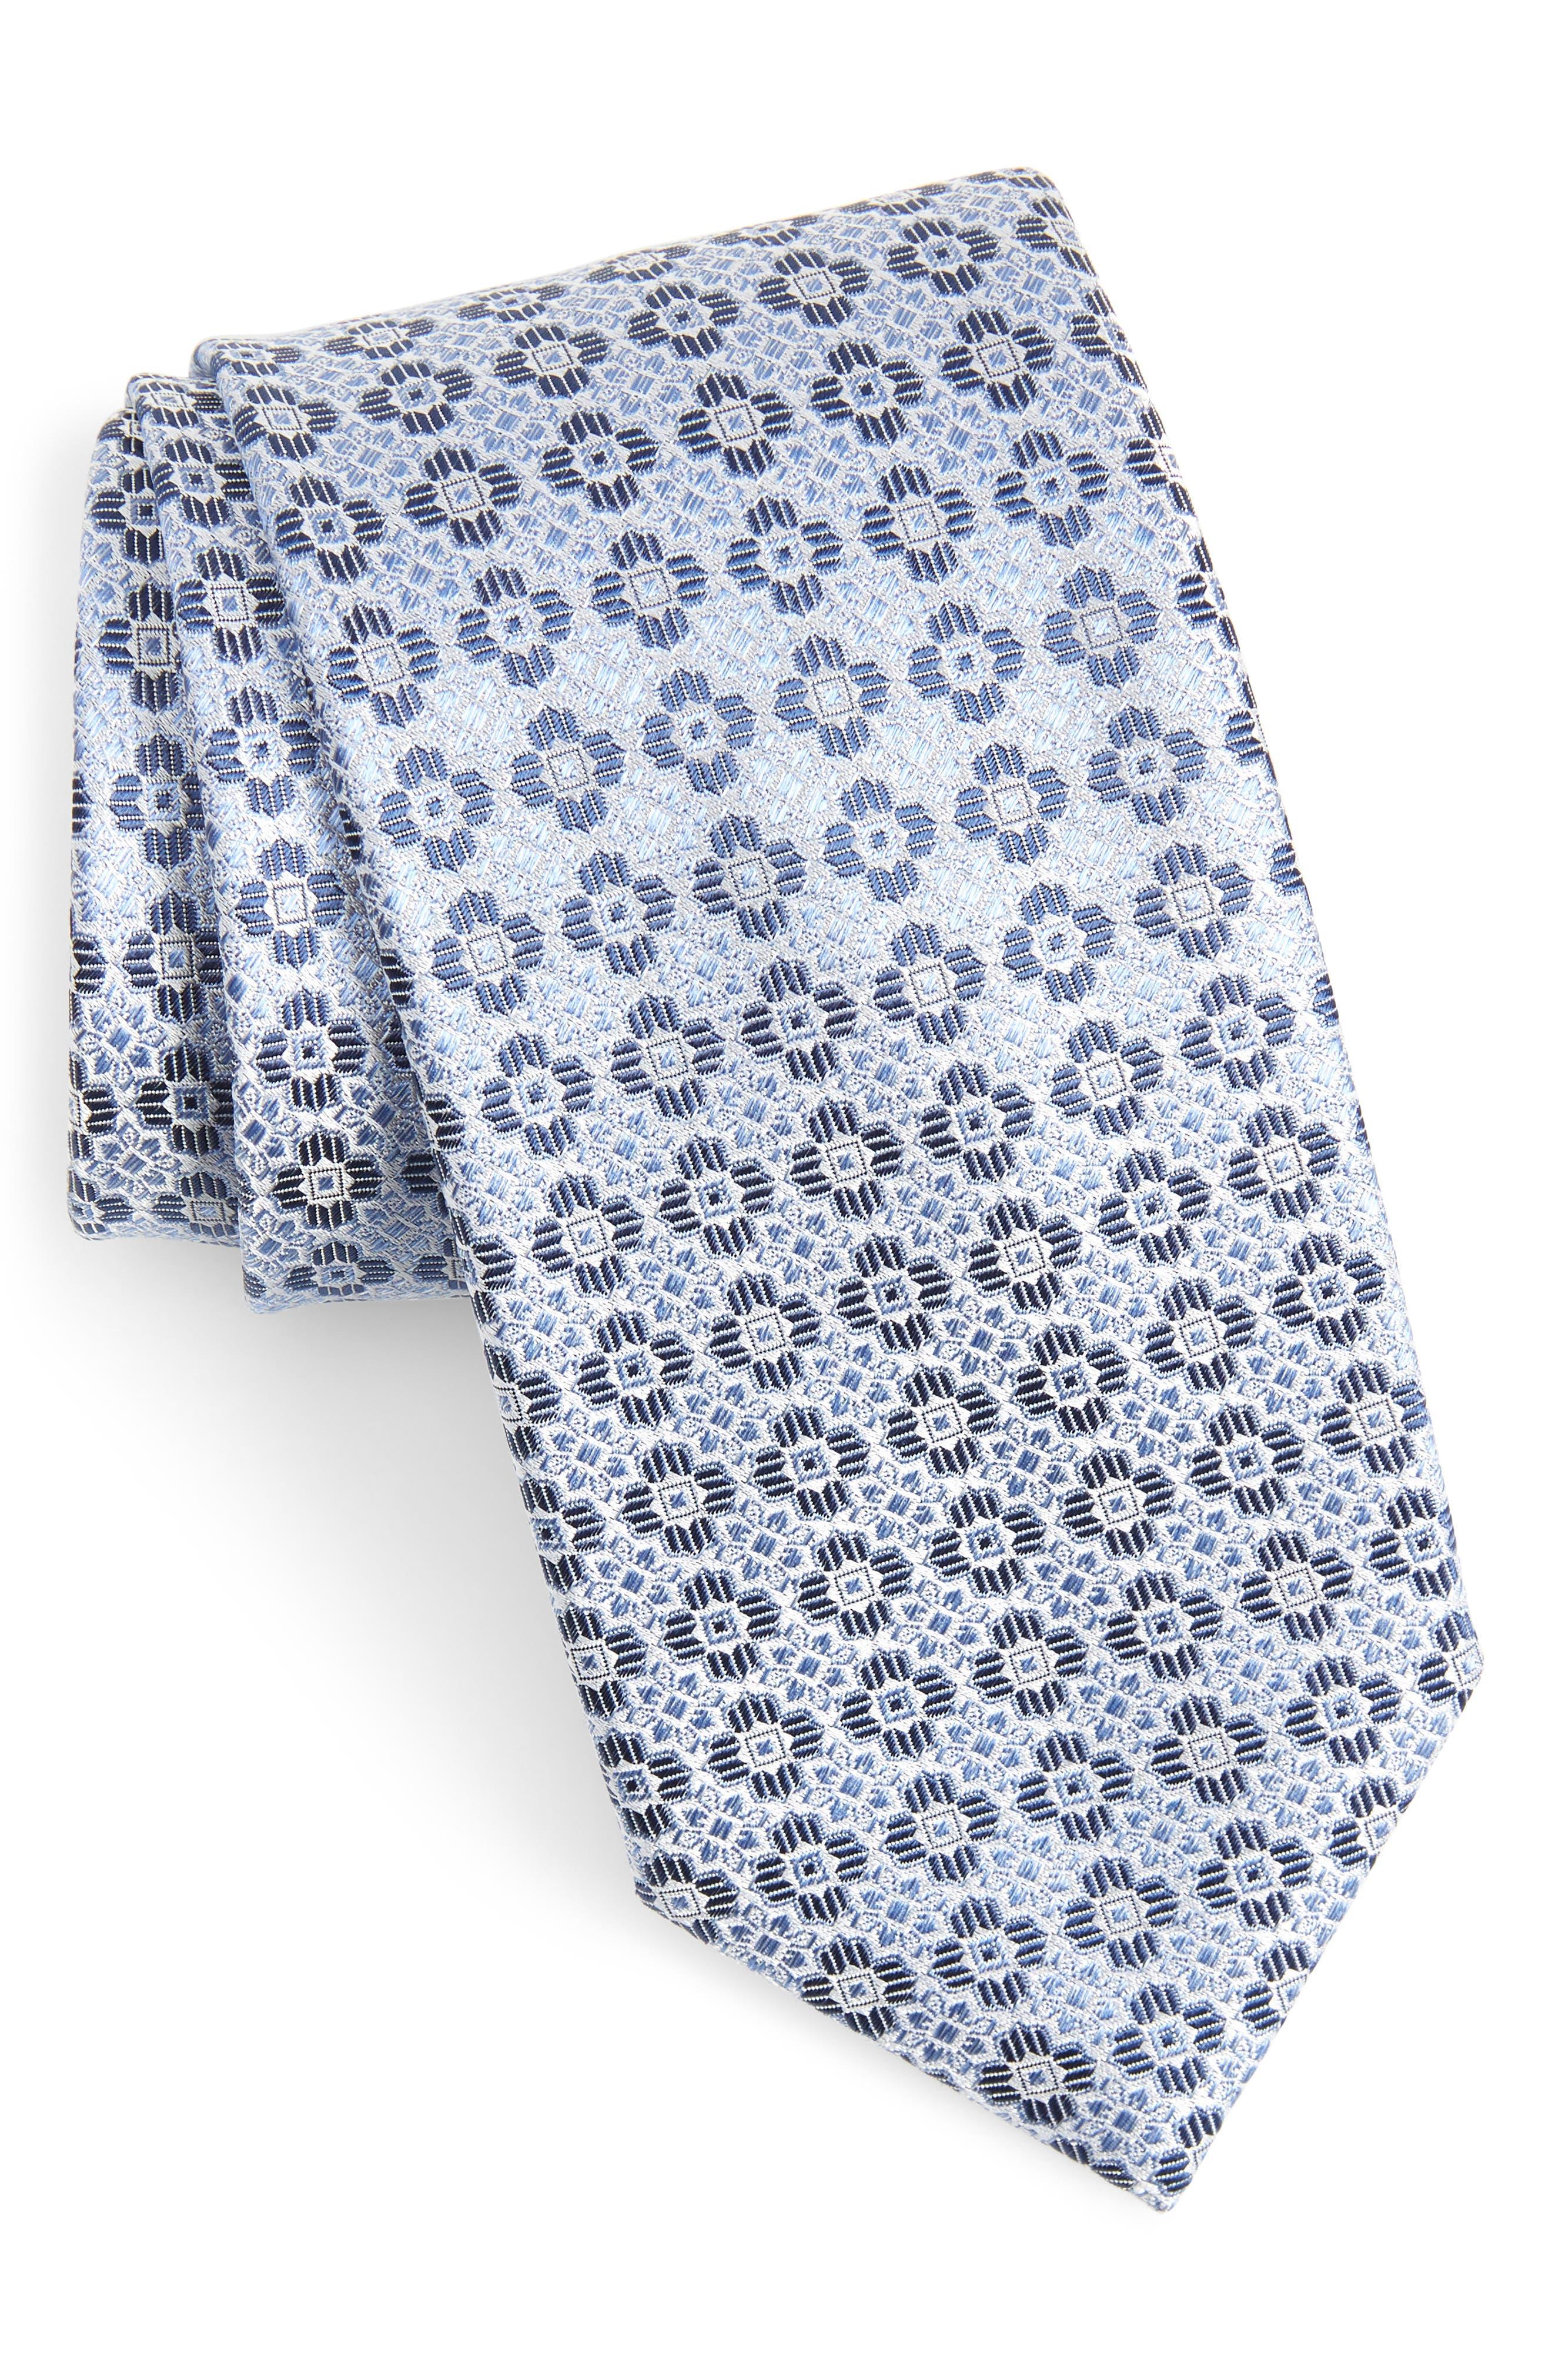 CANALI Medallion Silk Tie, Main, color, LIGHT BLUE